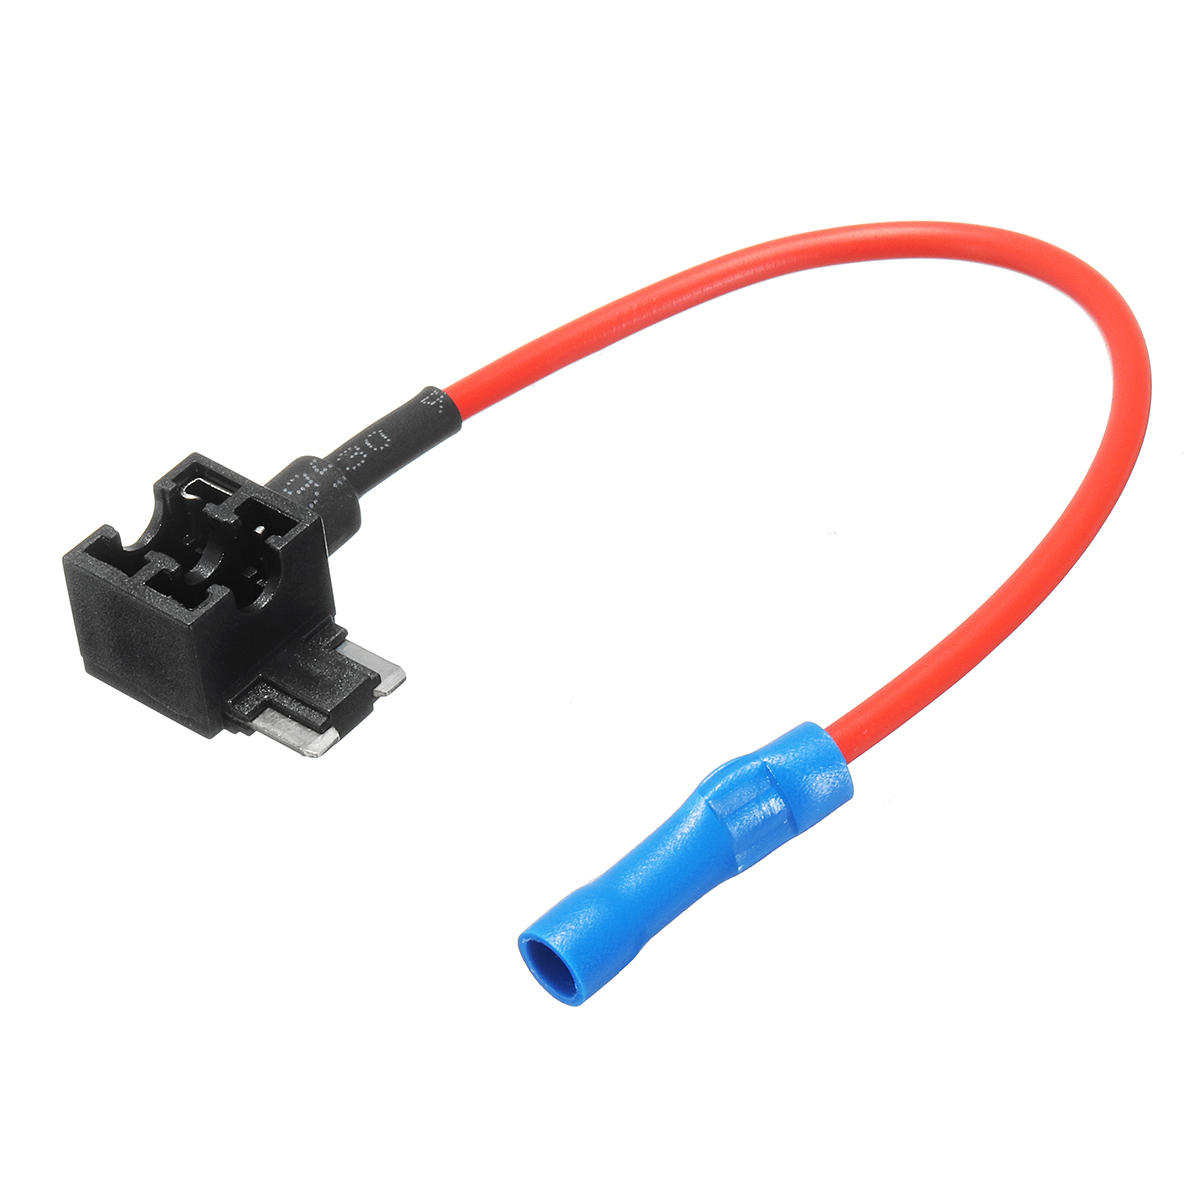 V-acn car add circuit tap mini micro standard ato atc blade fuse box holder  set Sale - Banggood.com-arrival notice-arrival noticeBanggood